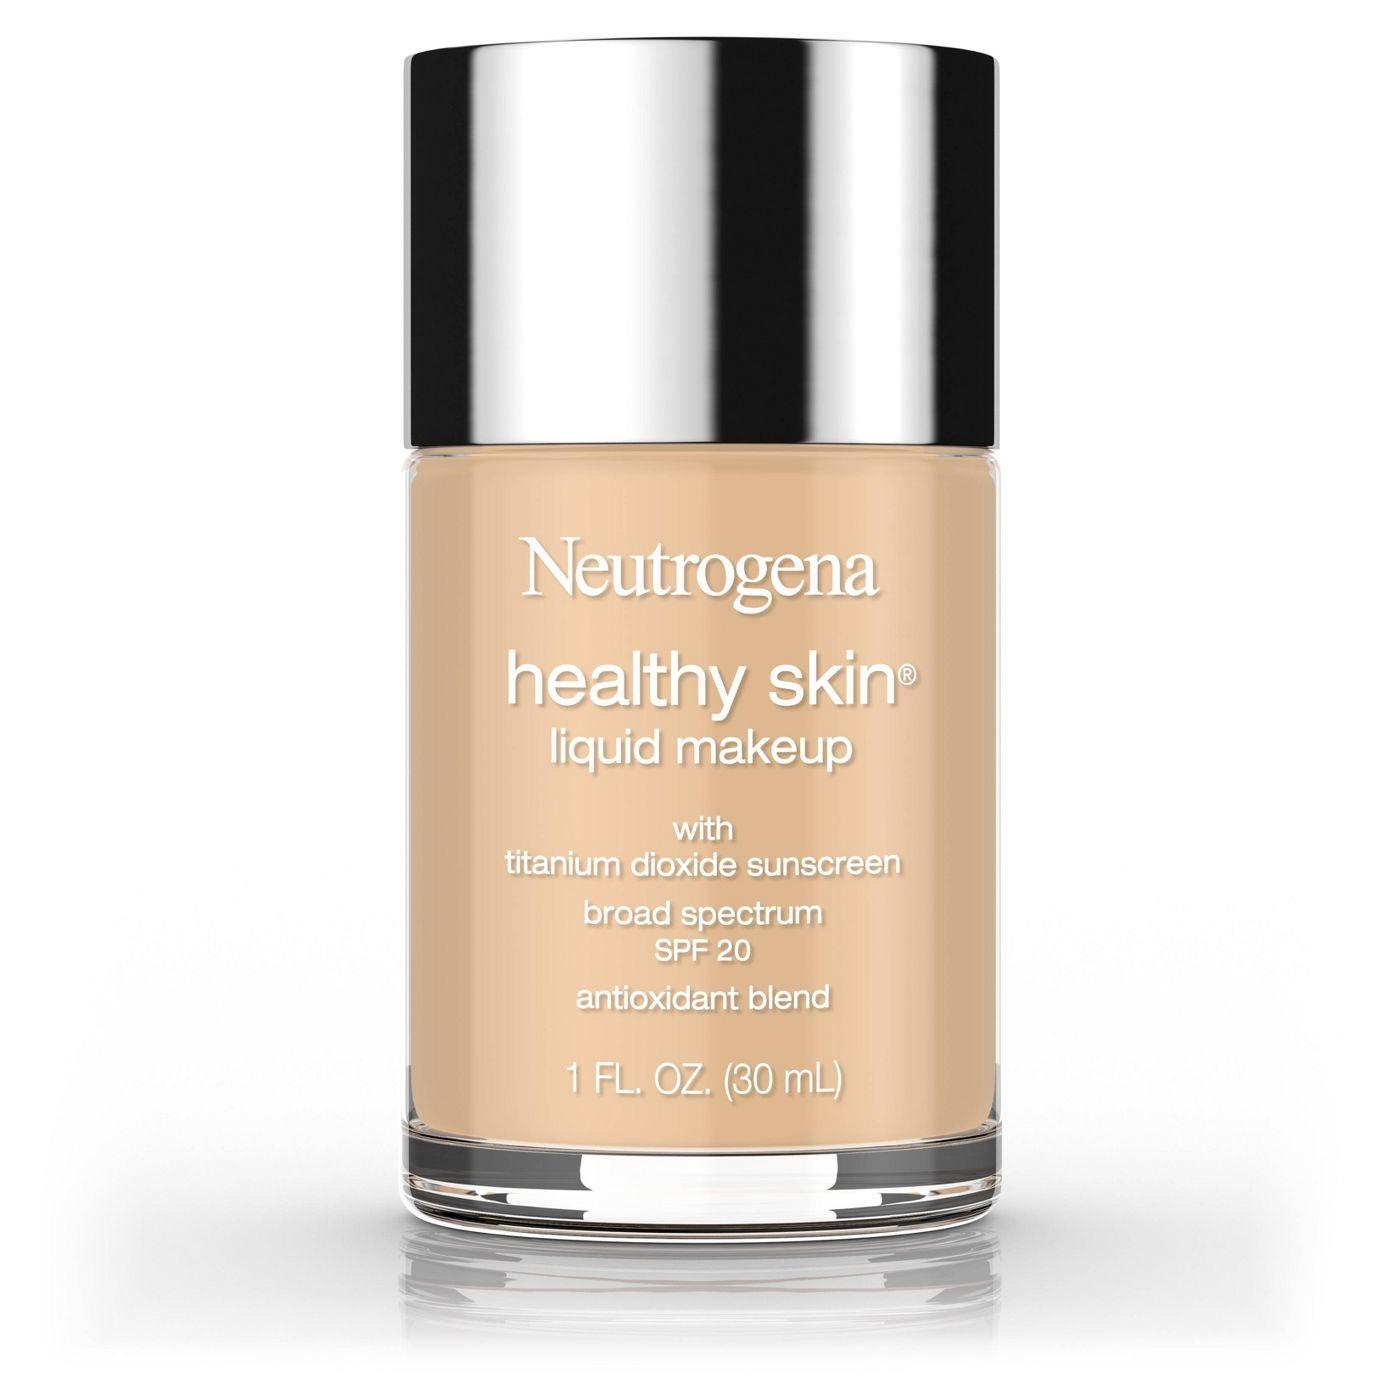 TikTok beauty neutrogena foundation